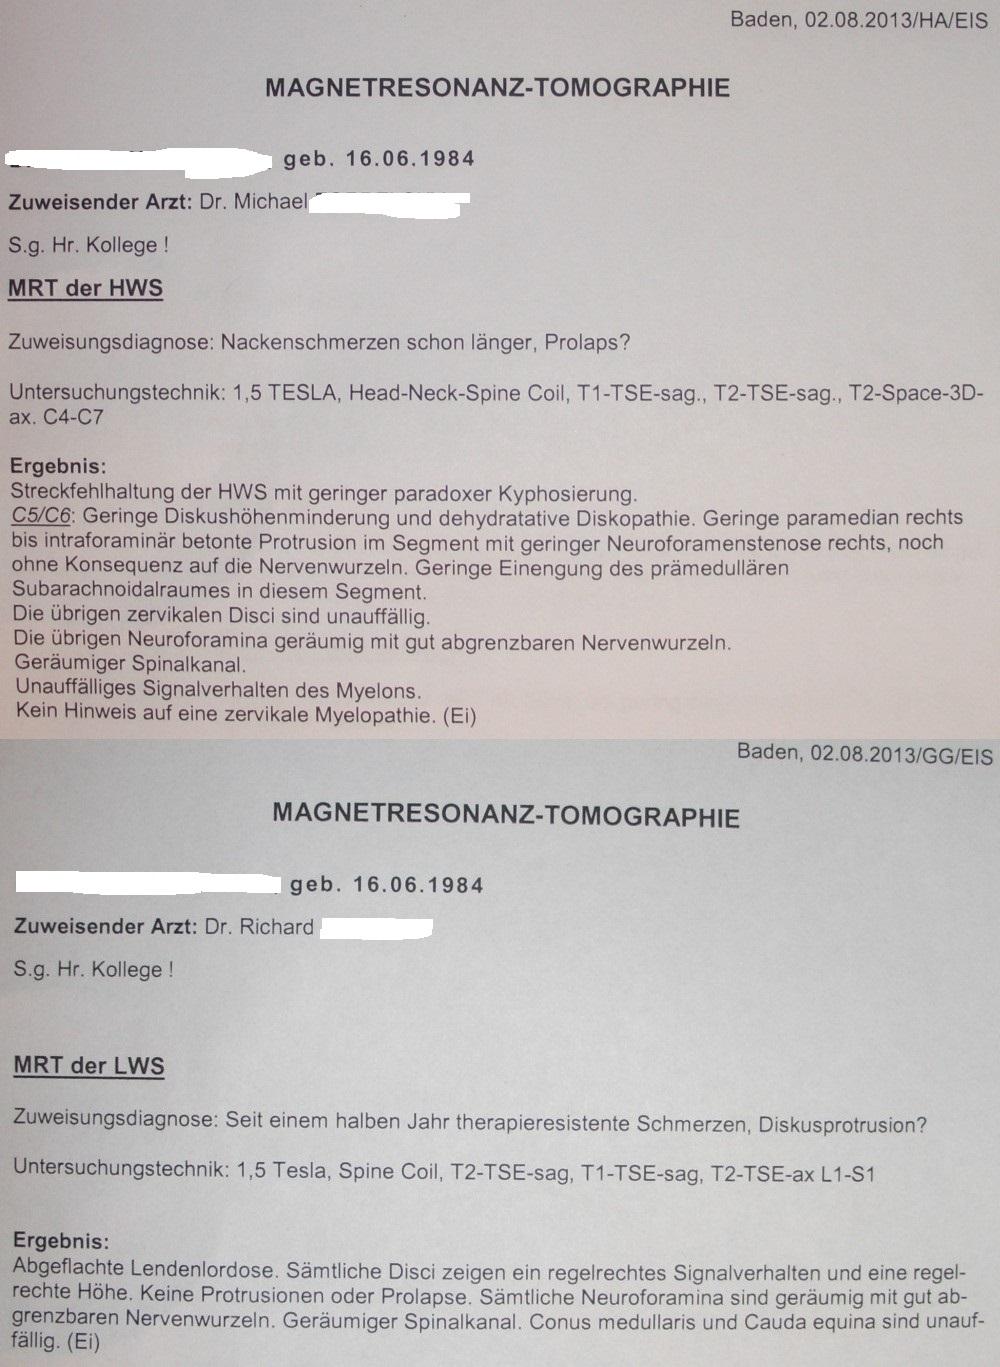 medizin-forum.de • Thema anzeigen - Befunderklärung HWS/BWS/LWS